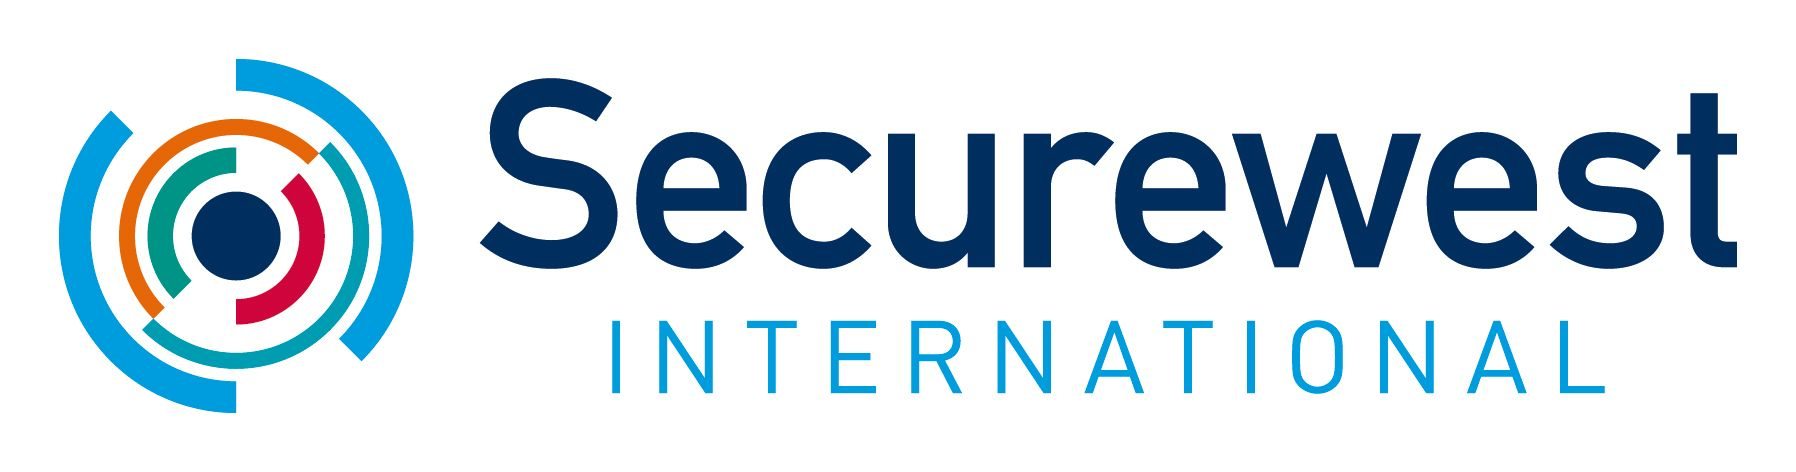 Securewest International